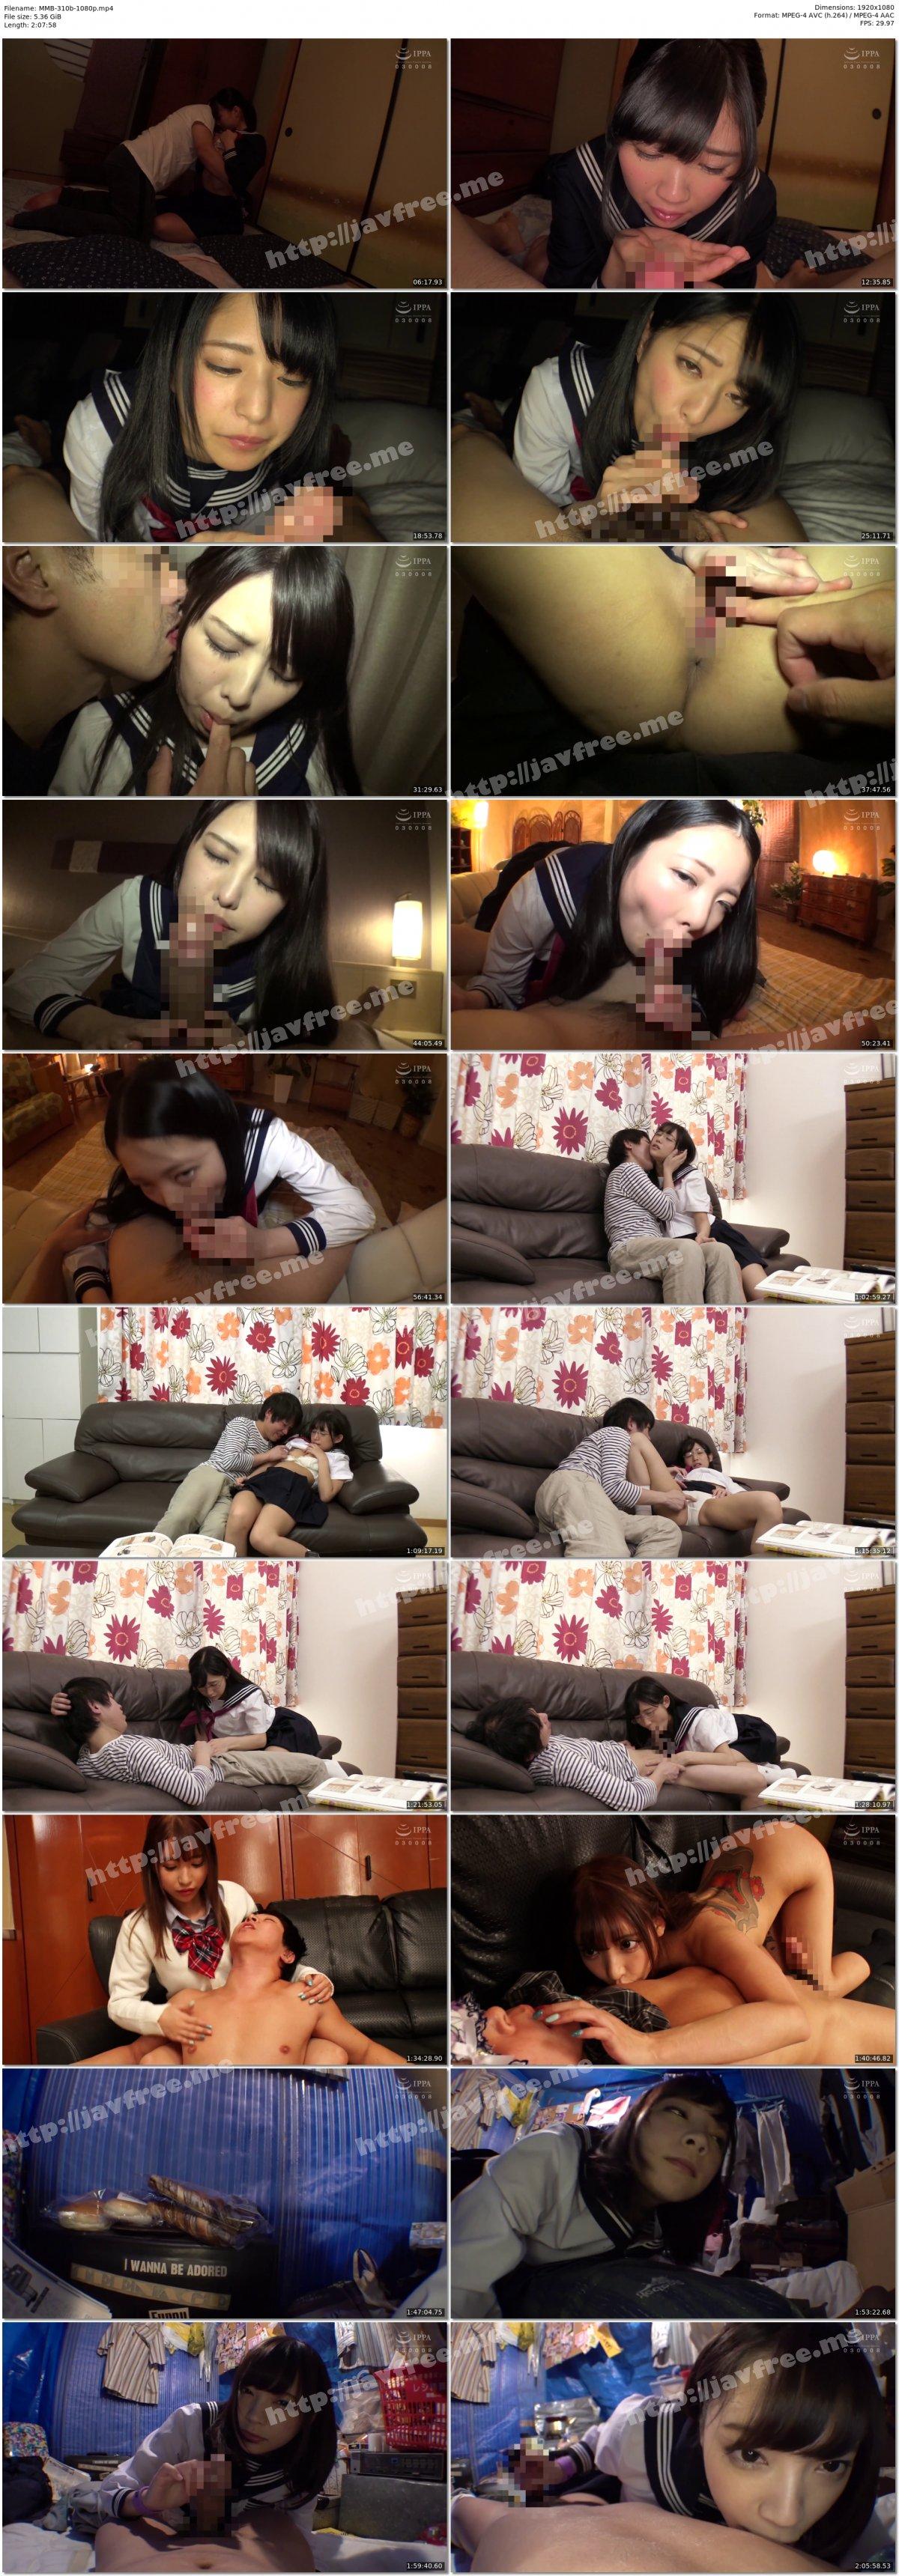 [HD][MMB-310] 女子●生のイカせようと懸命に頑張る円光口マ●コ15人